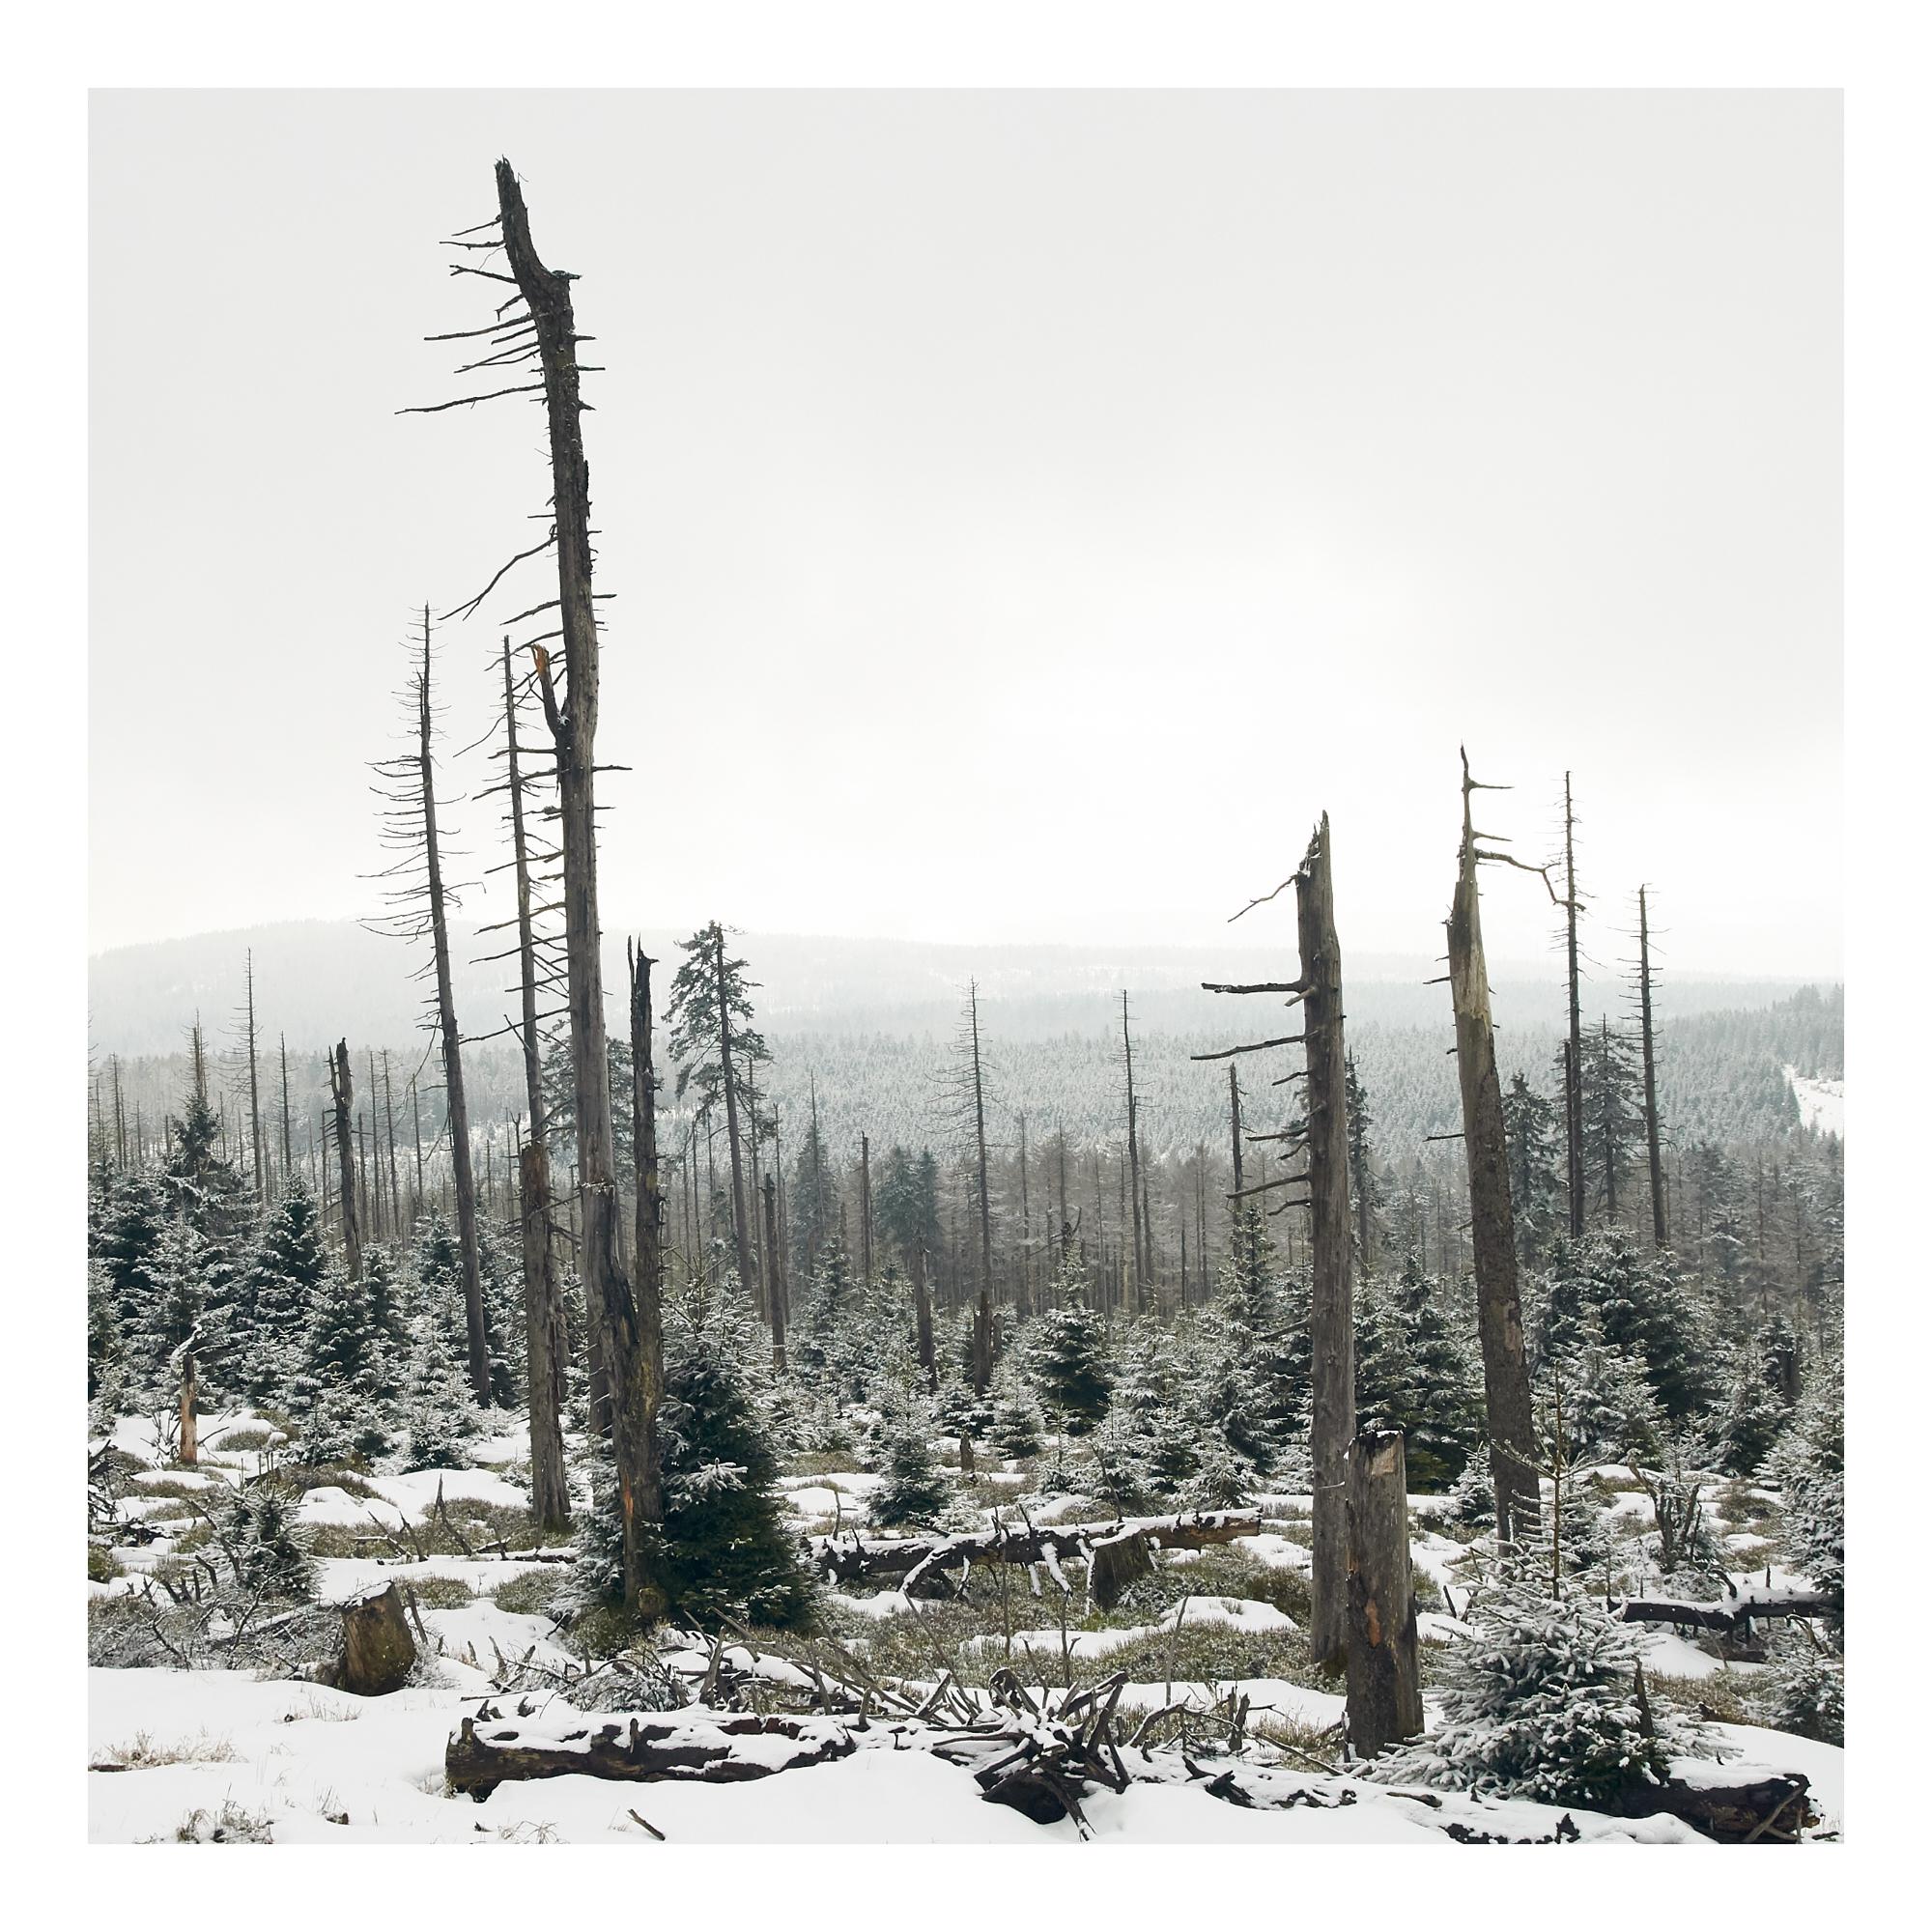 Brocken-trees2-untitled-0677 1.jpg